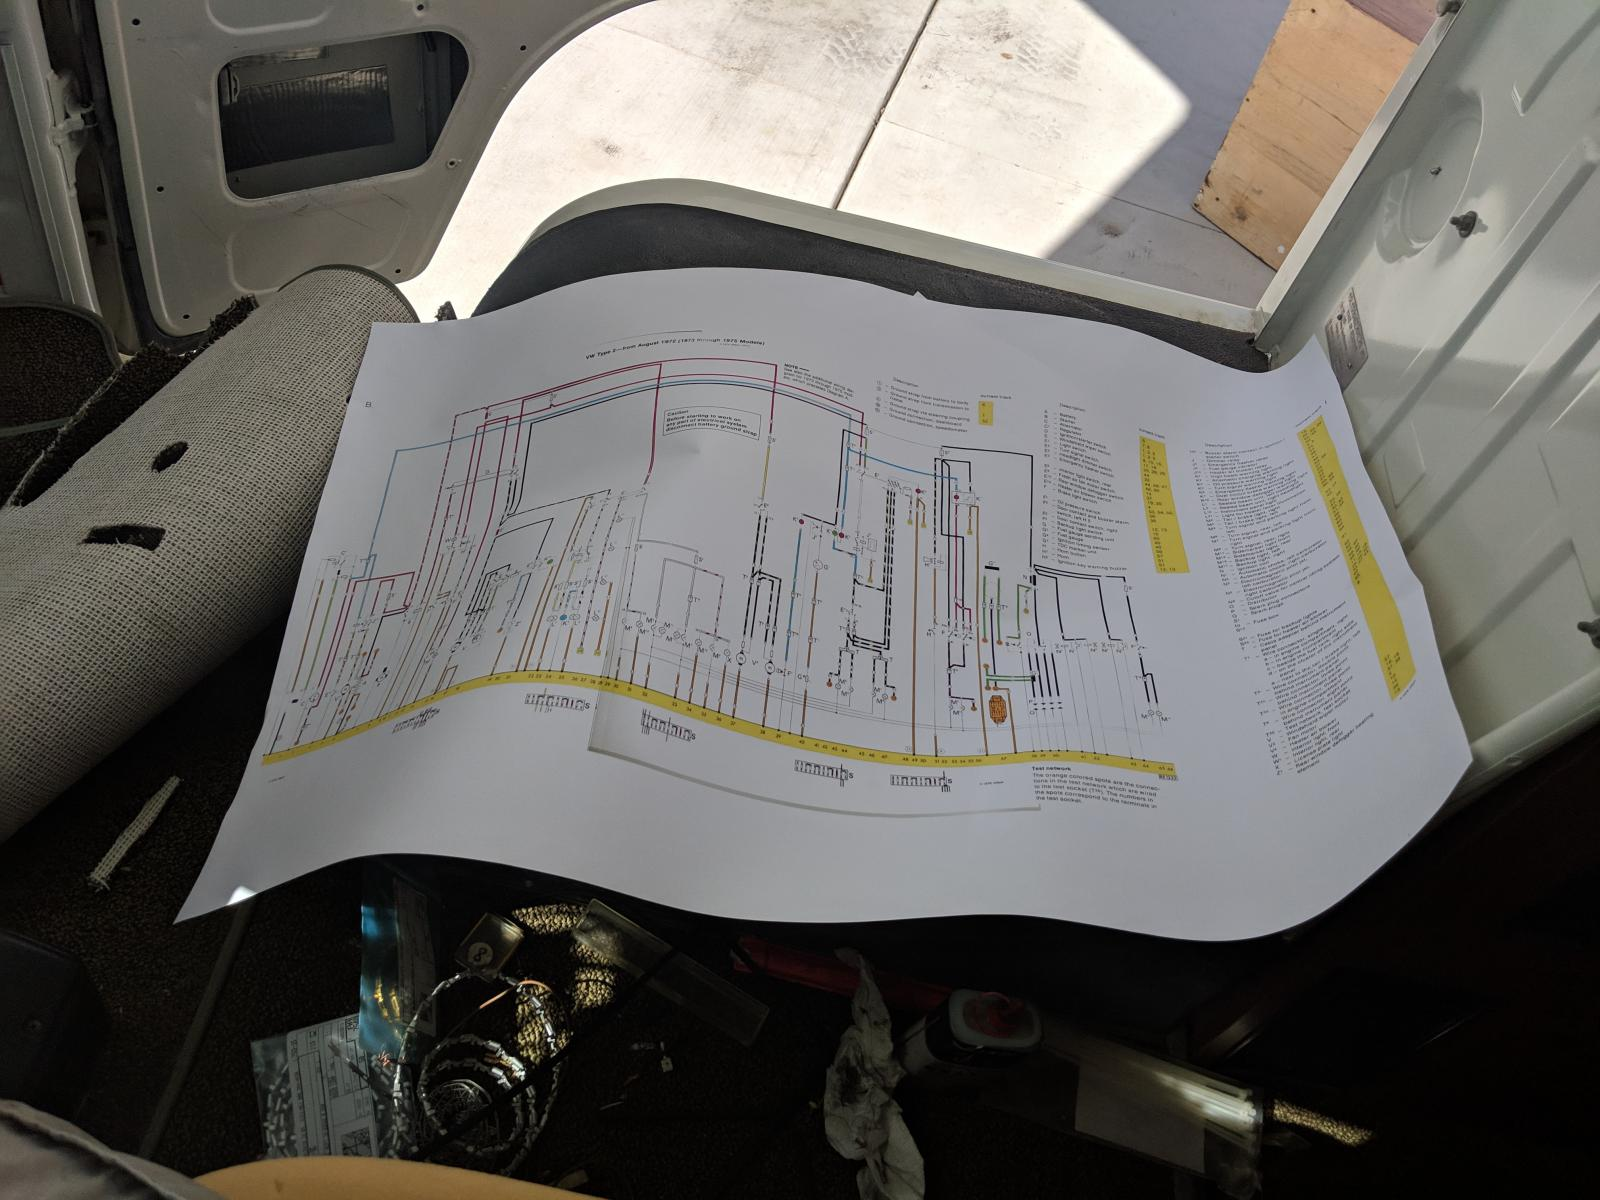 Wiring Diagram on 22re intake diagram, air cooled engine diagram, 1980s porsche engine diagram, porsche 996 engine diagram, vtec diagram, porsche 911 engine diagram, porsche boxster engine ground wiring diagram, walking diagram,